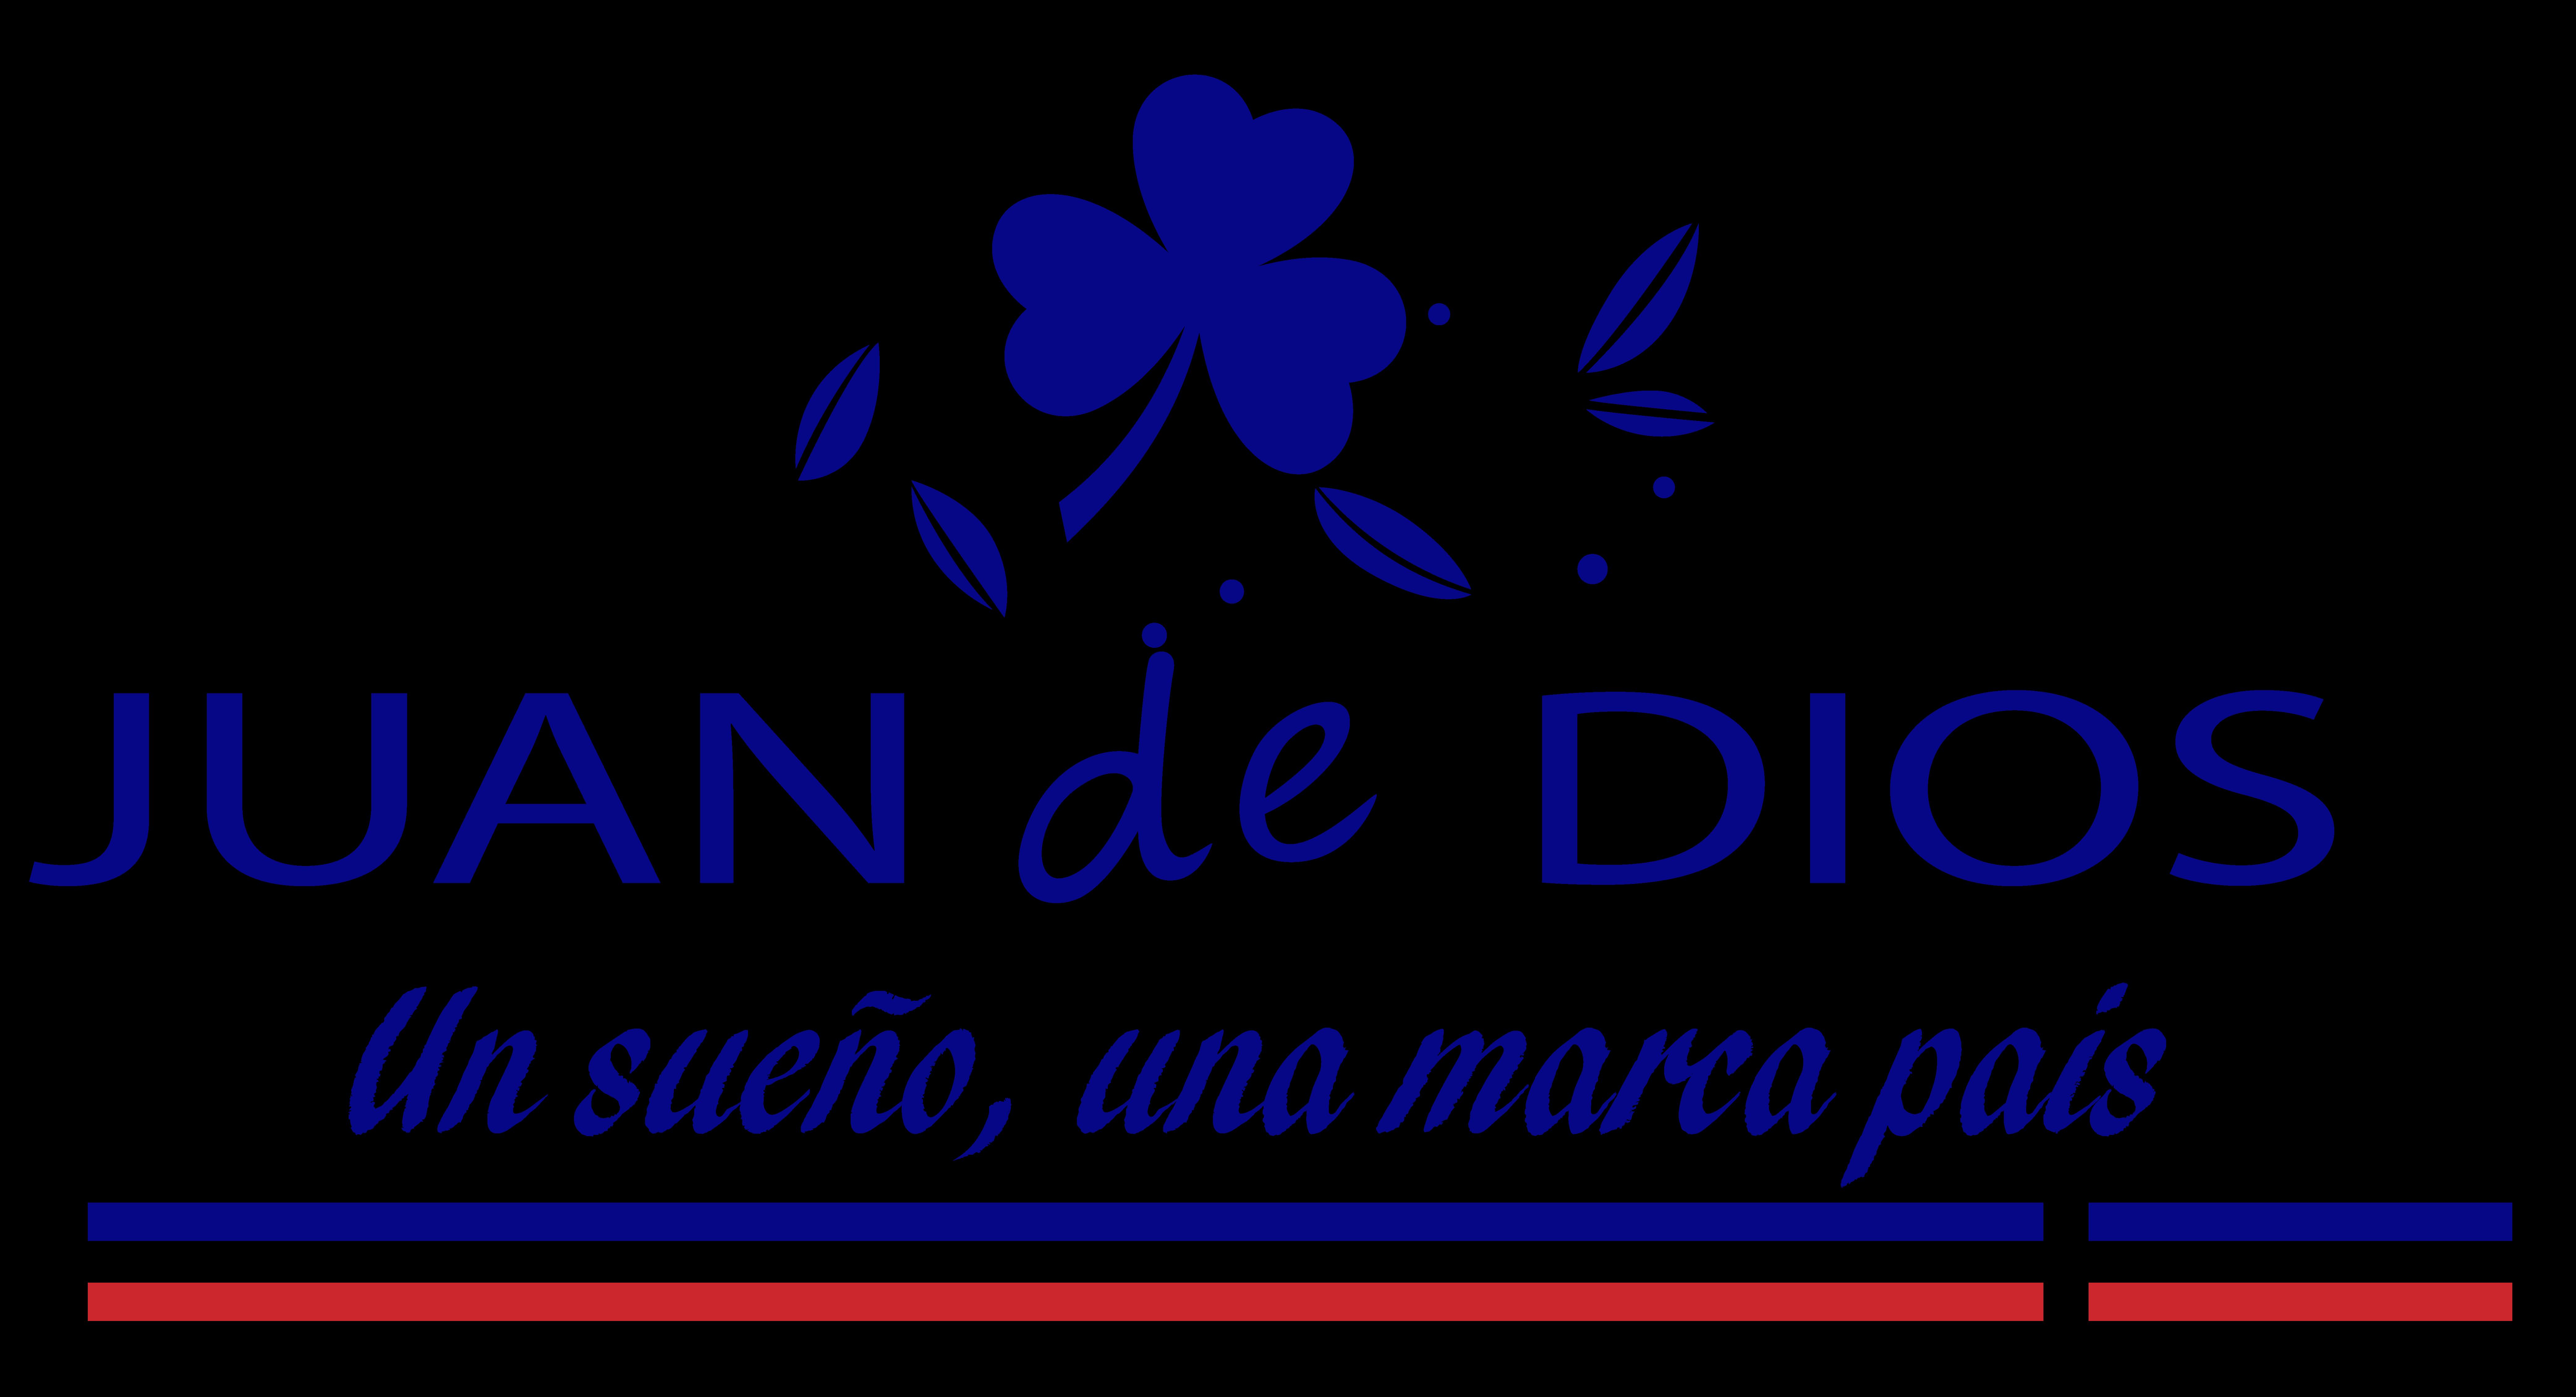 Juan de Dios Chacabanas